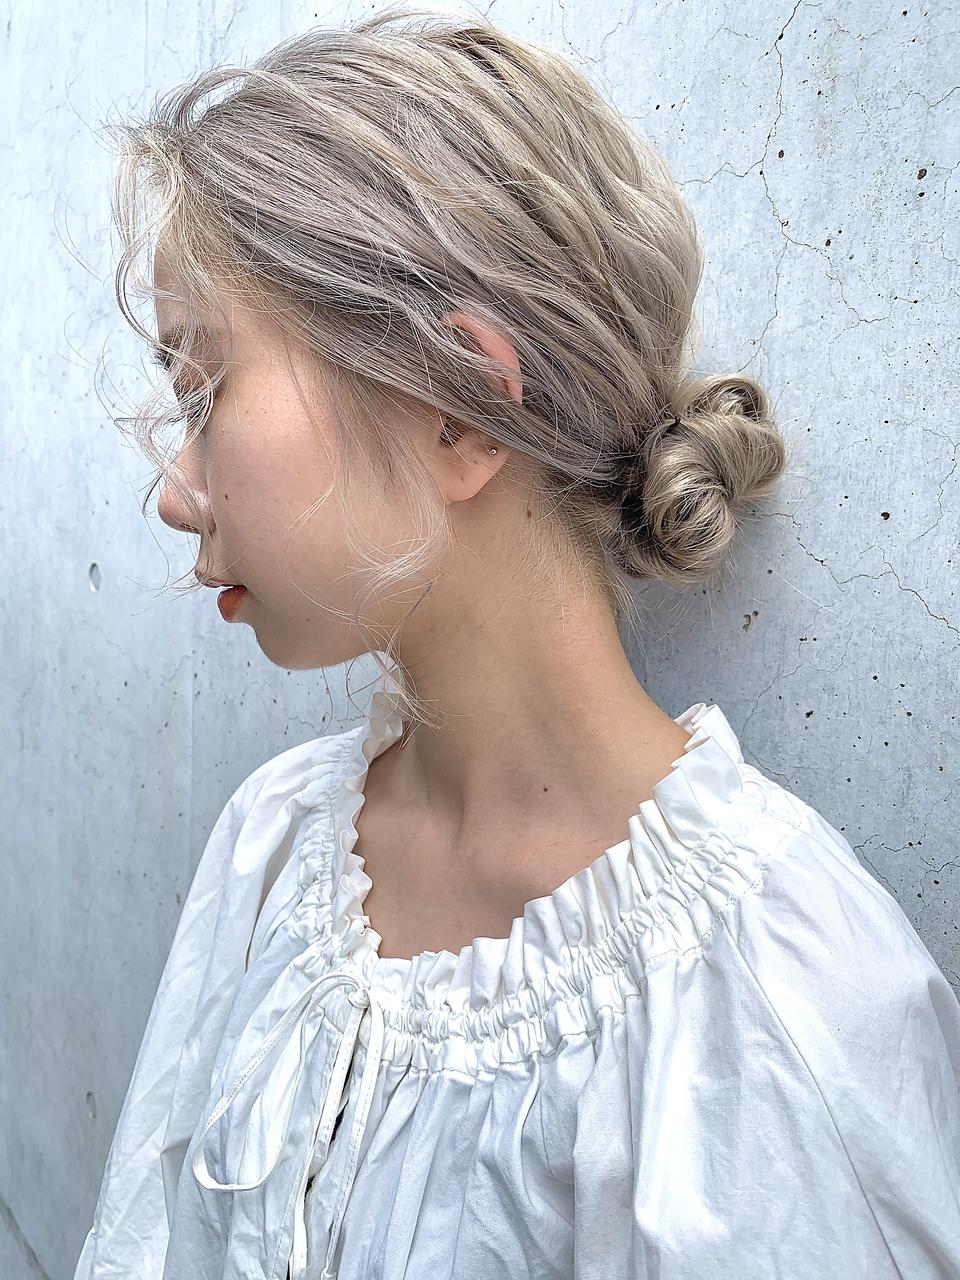 LAPENSEE beige 小島/ホワイティベージュ/シニヨンアレンジ